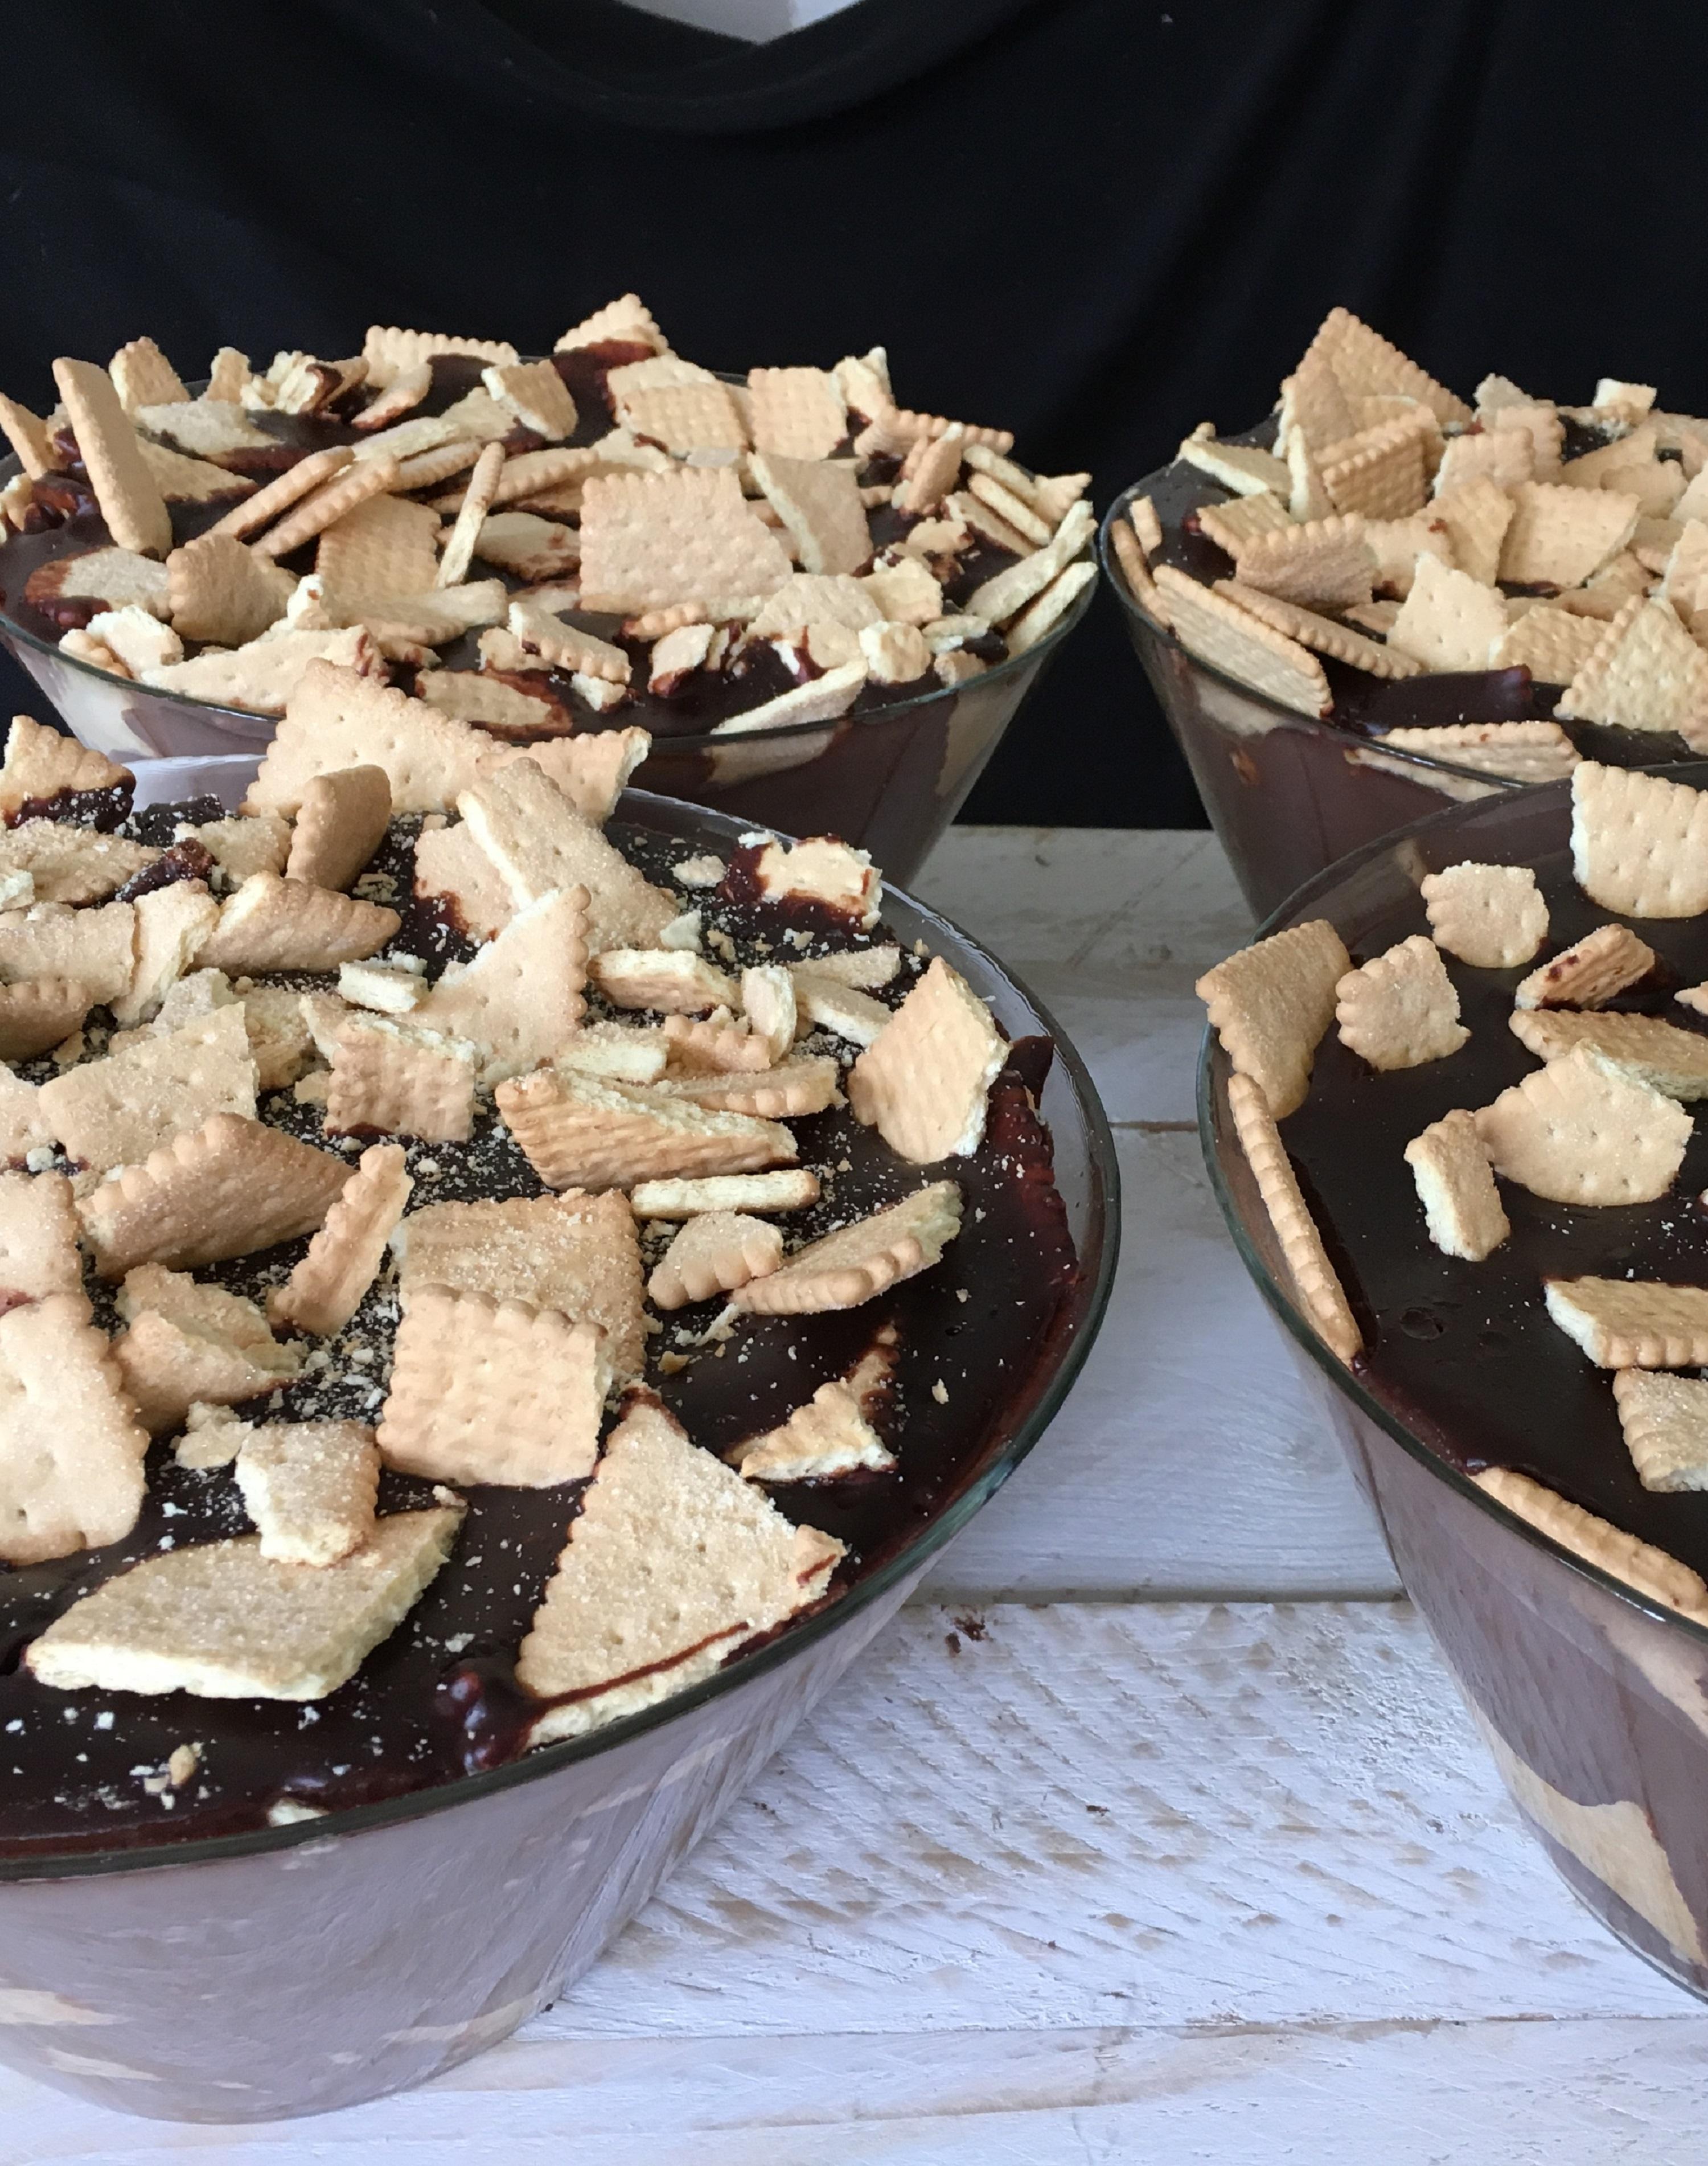 Kinderbuffet chocoladepudding met koekjes